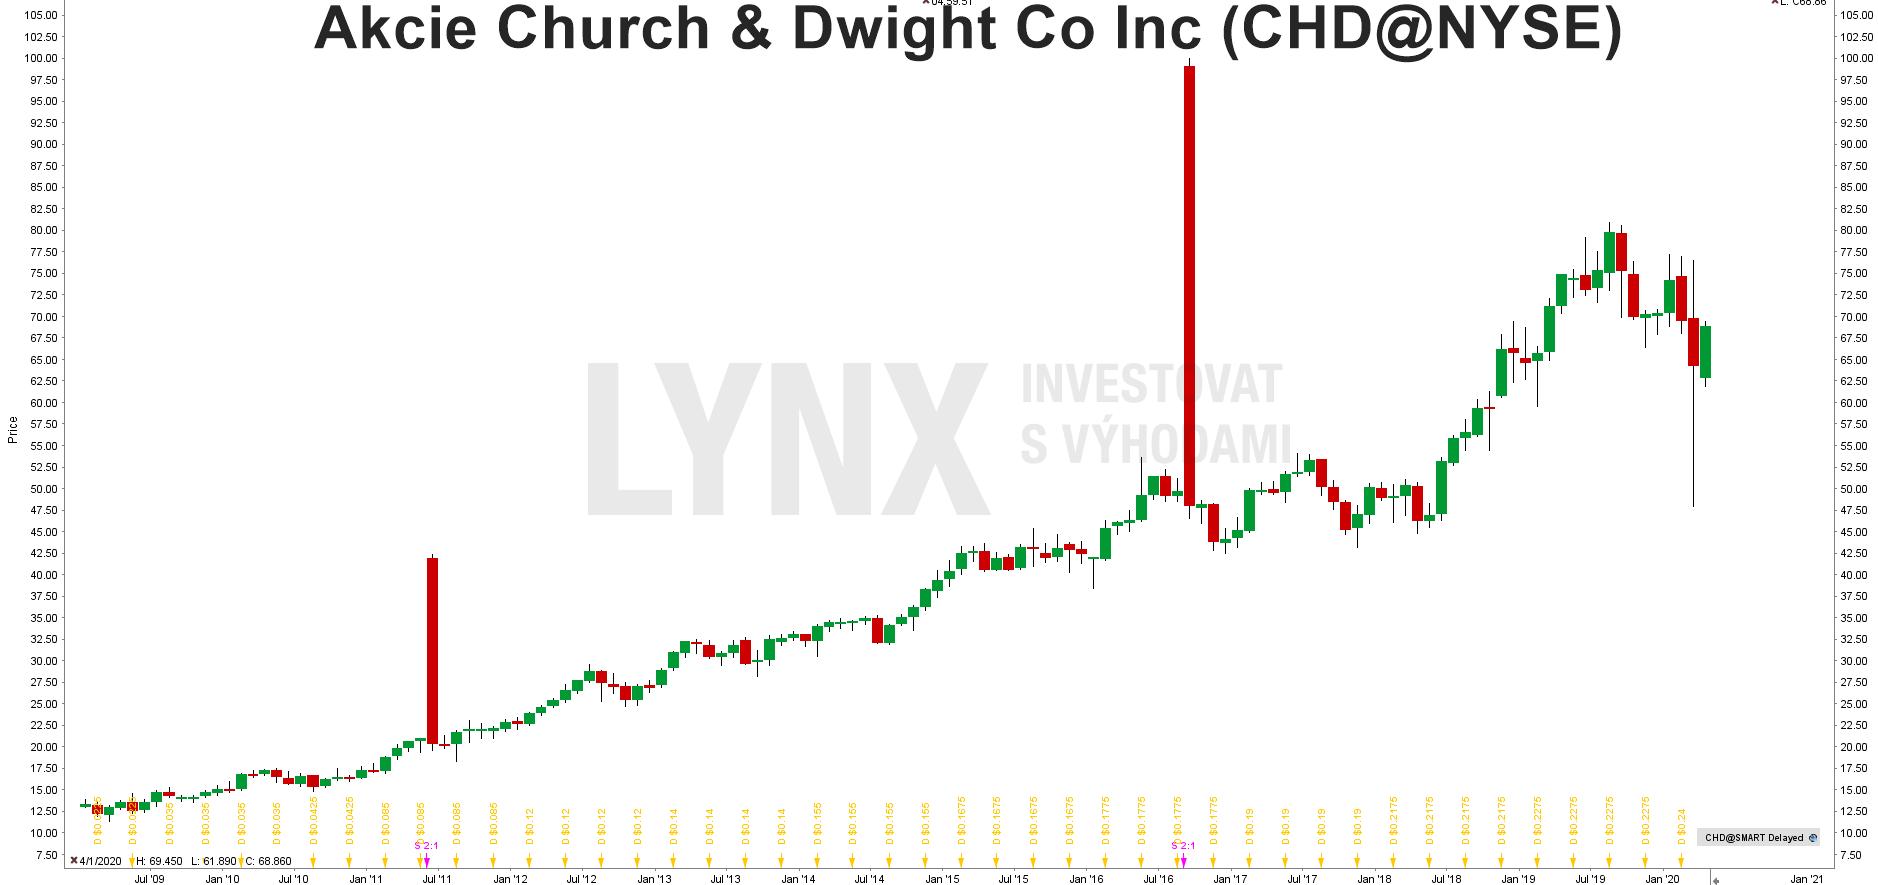 Graf akcie Church & Dwight (CHD)